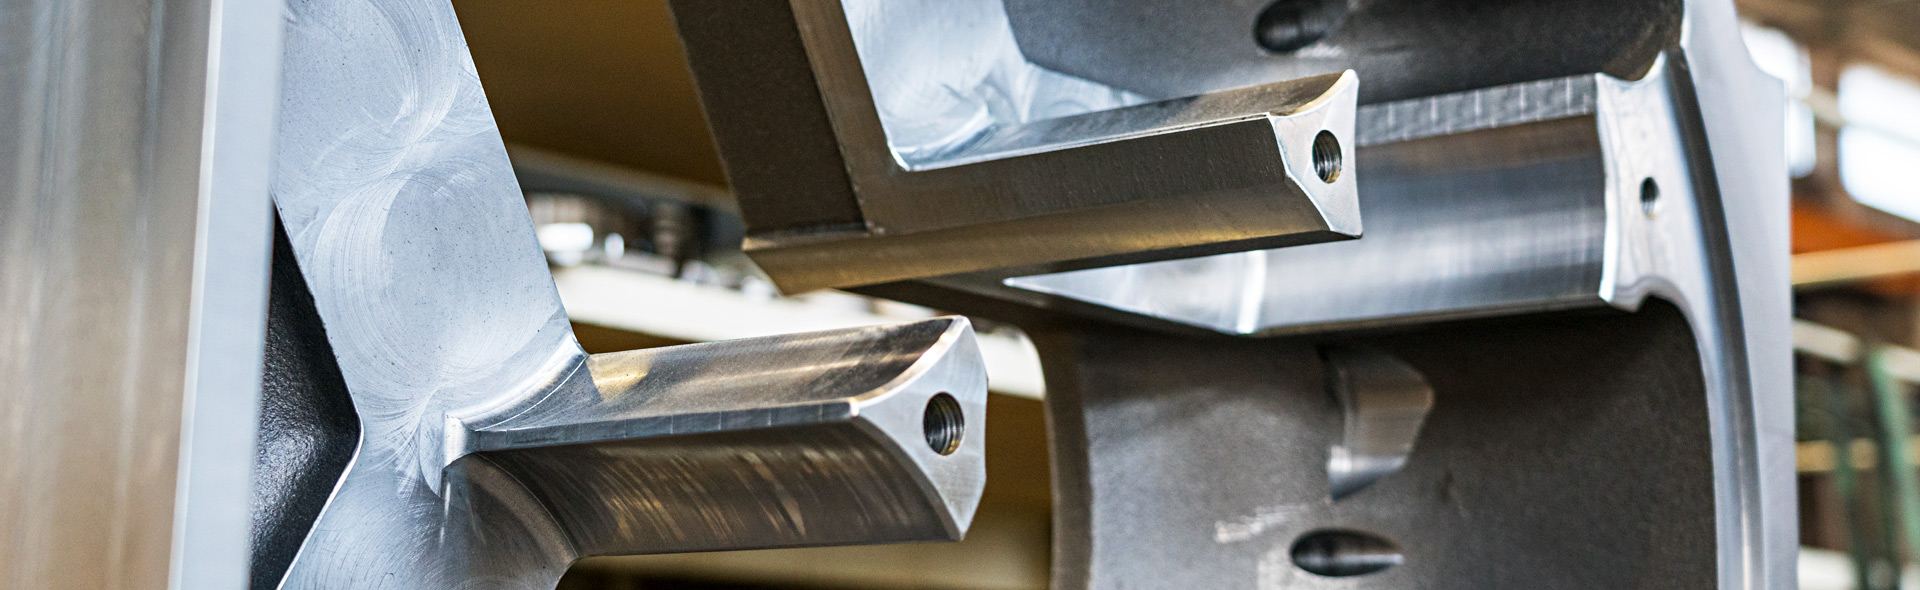 Produkte Fräsen | Maschinenbau Mundil